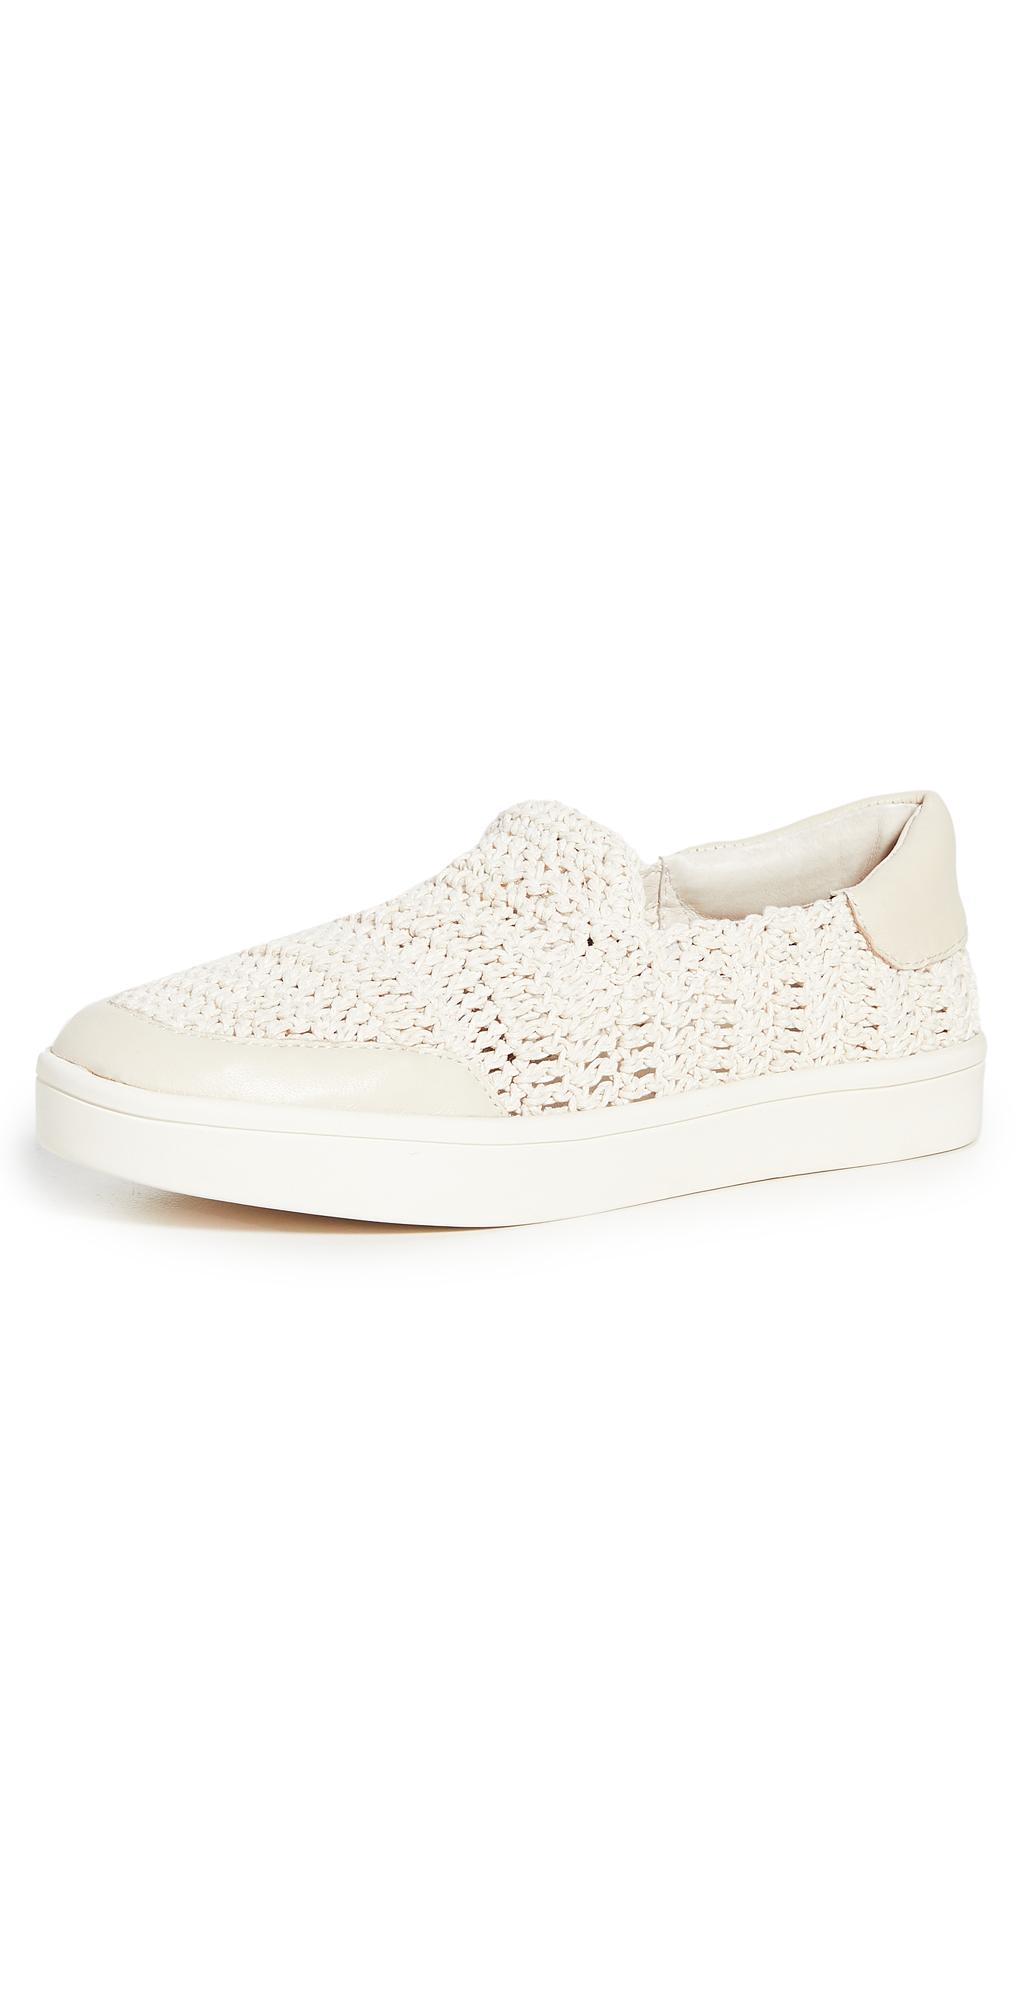 Formentera Sneakers